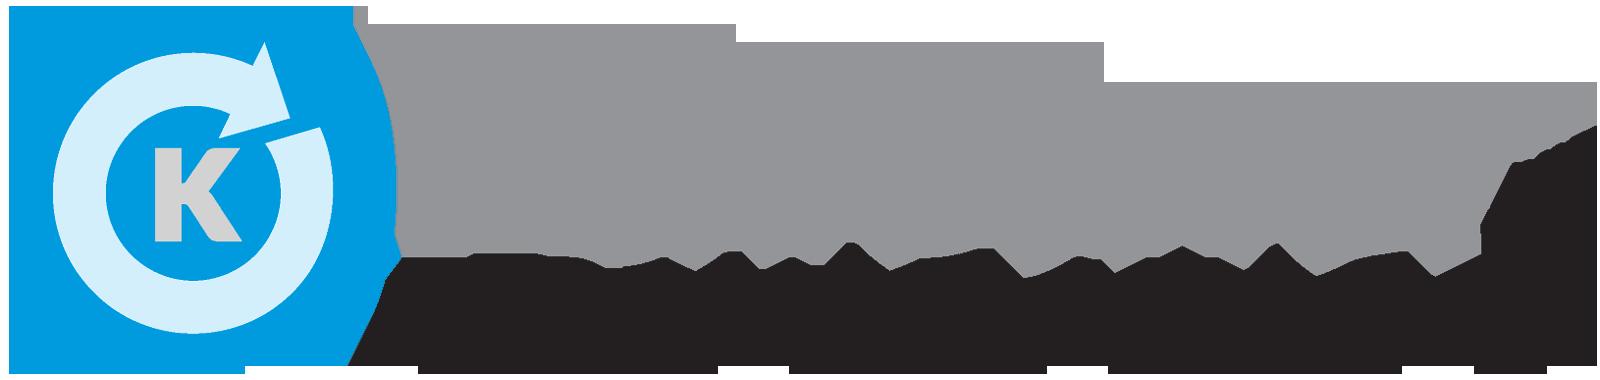 Braccialetti gratis da Kerstner Foundation